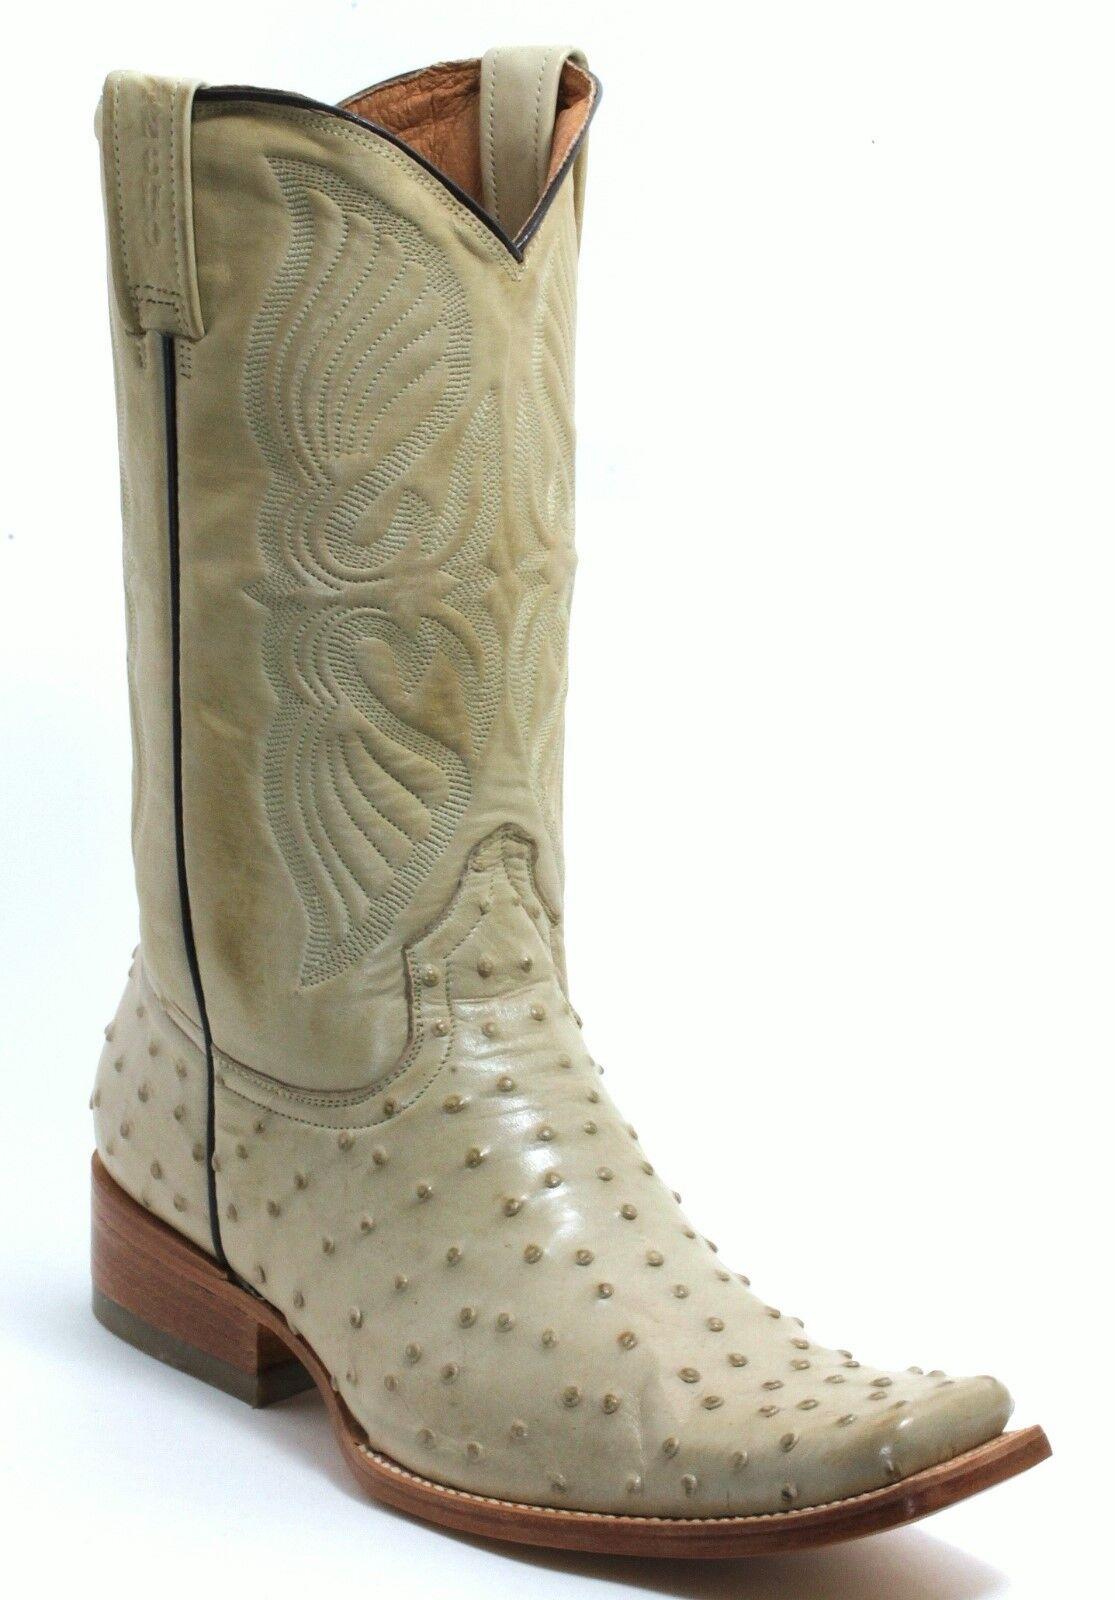 5 Cowboystiefel Westernreitstiefel Texas Stiefel Western Rancho Strauß Roper 42